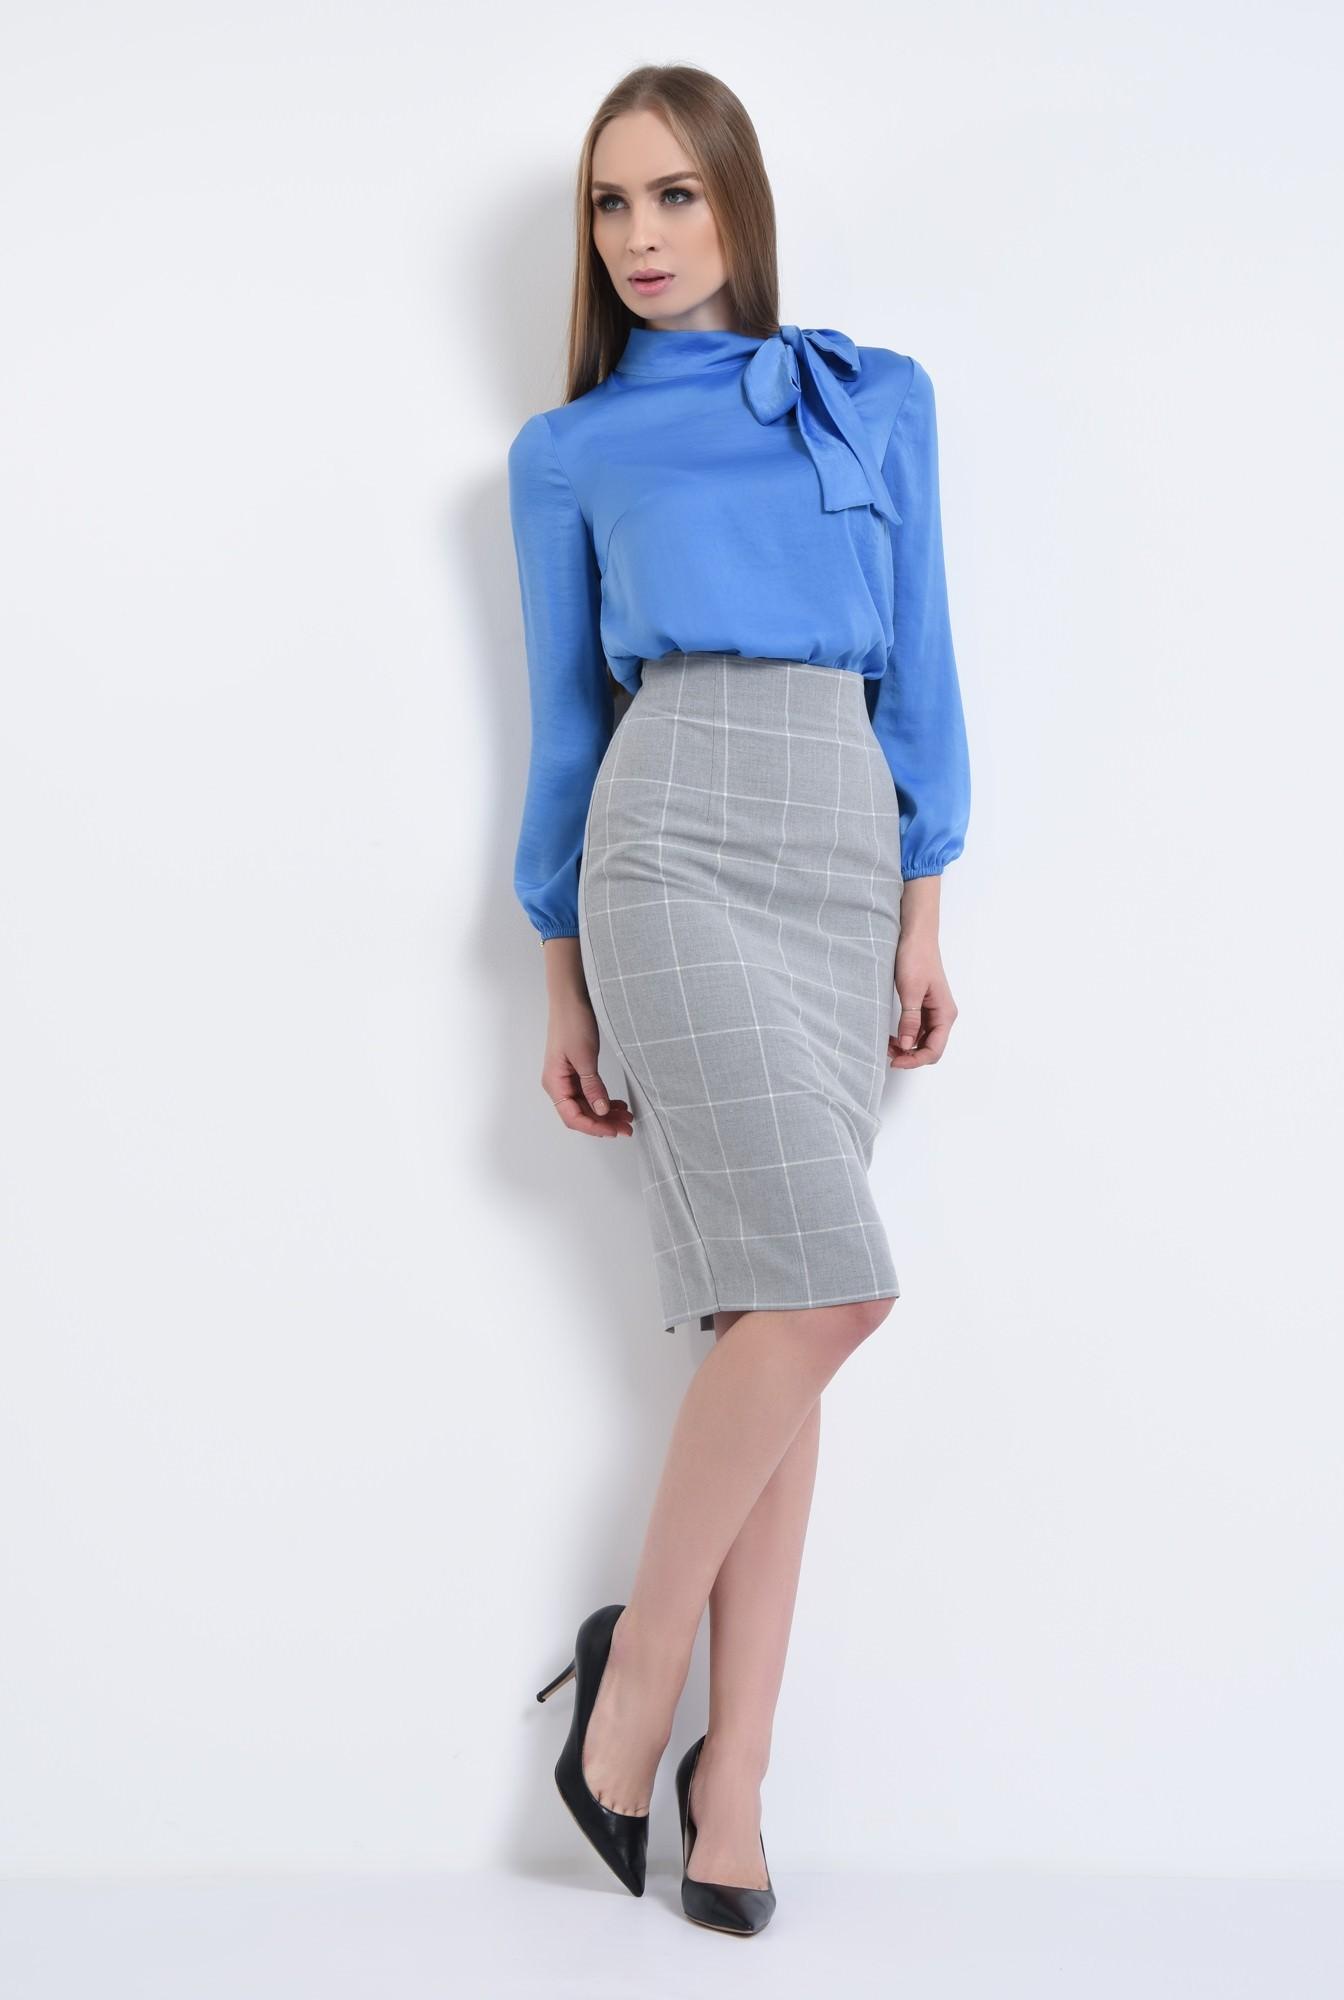 3 - bluza office, bleu, satinata, maneci lungi